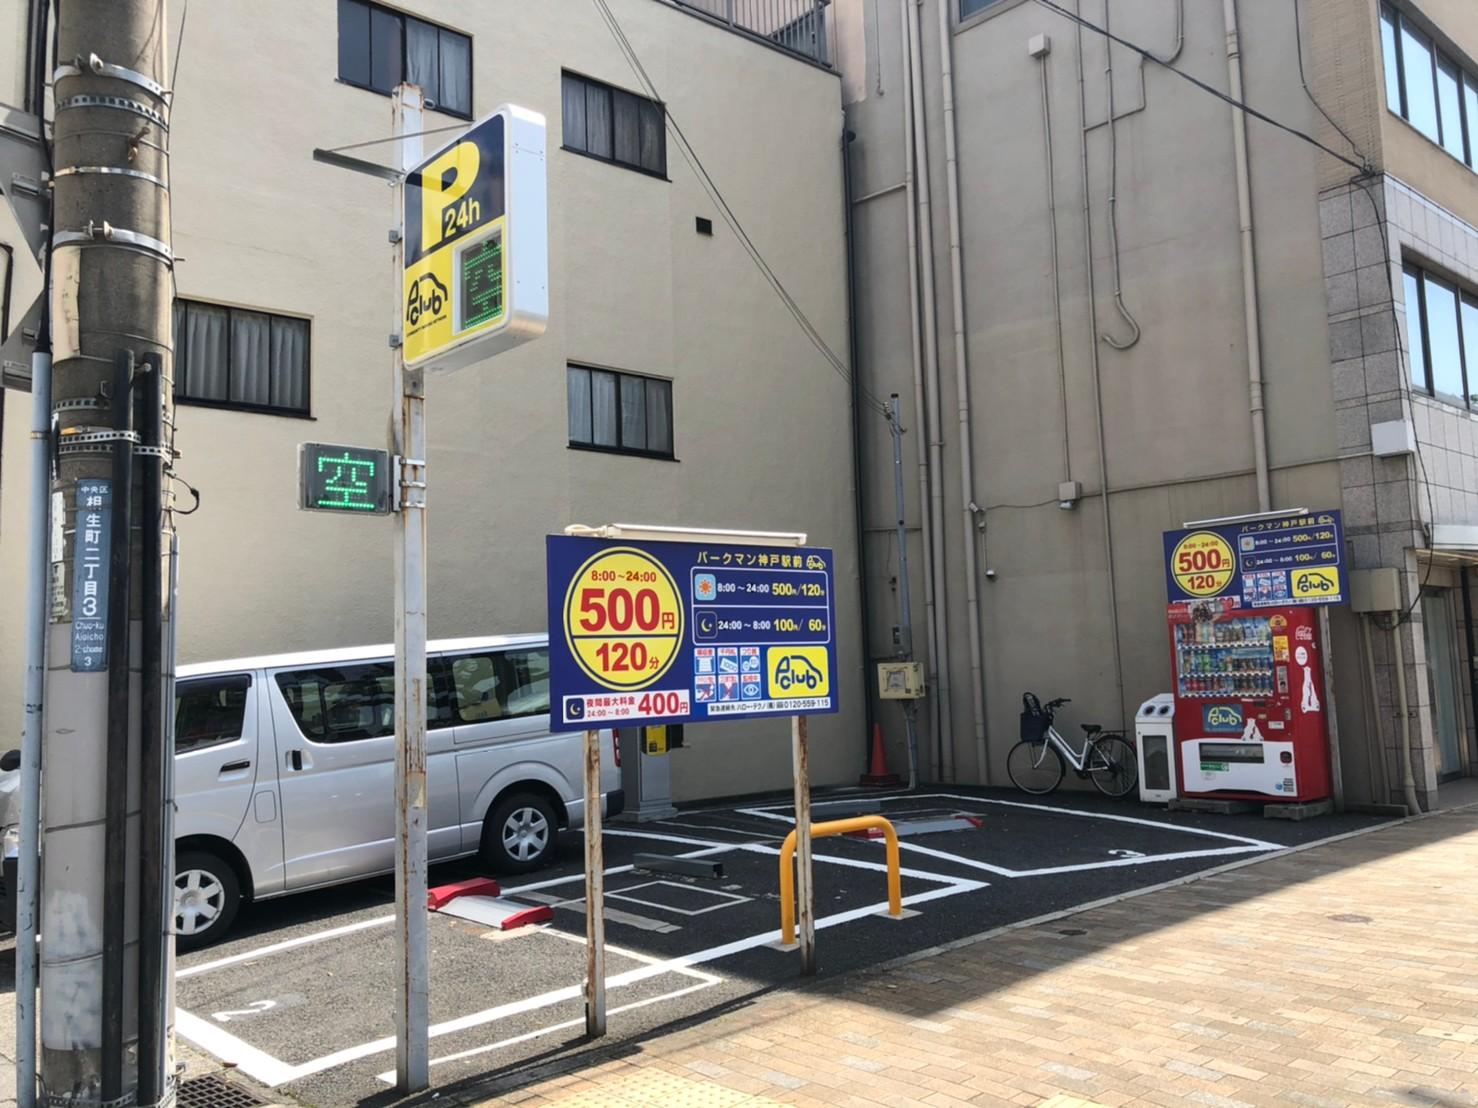 【時間貸し駐車場 神戸市中央区相生町】パークマン神戸駅前